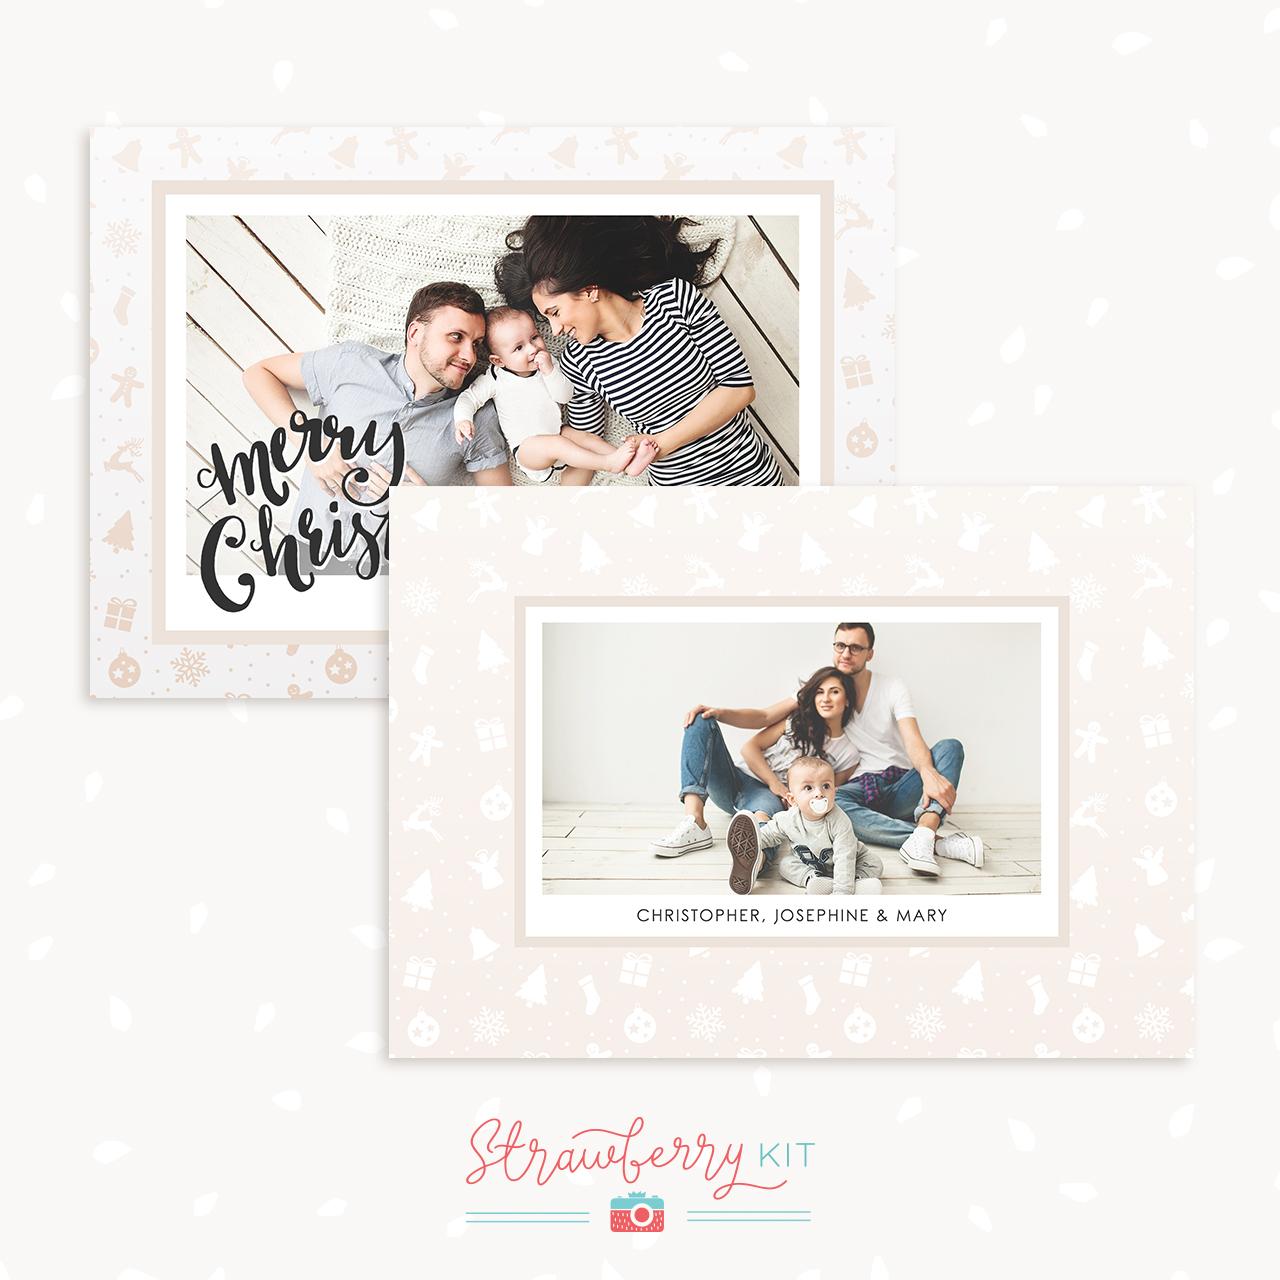 Christmas Card Template Photoshop Photographer